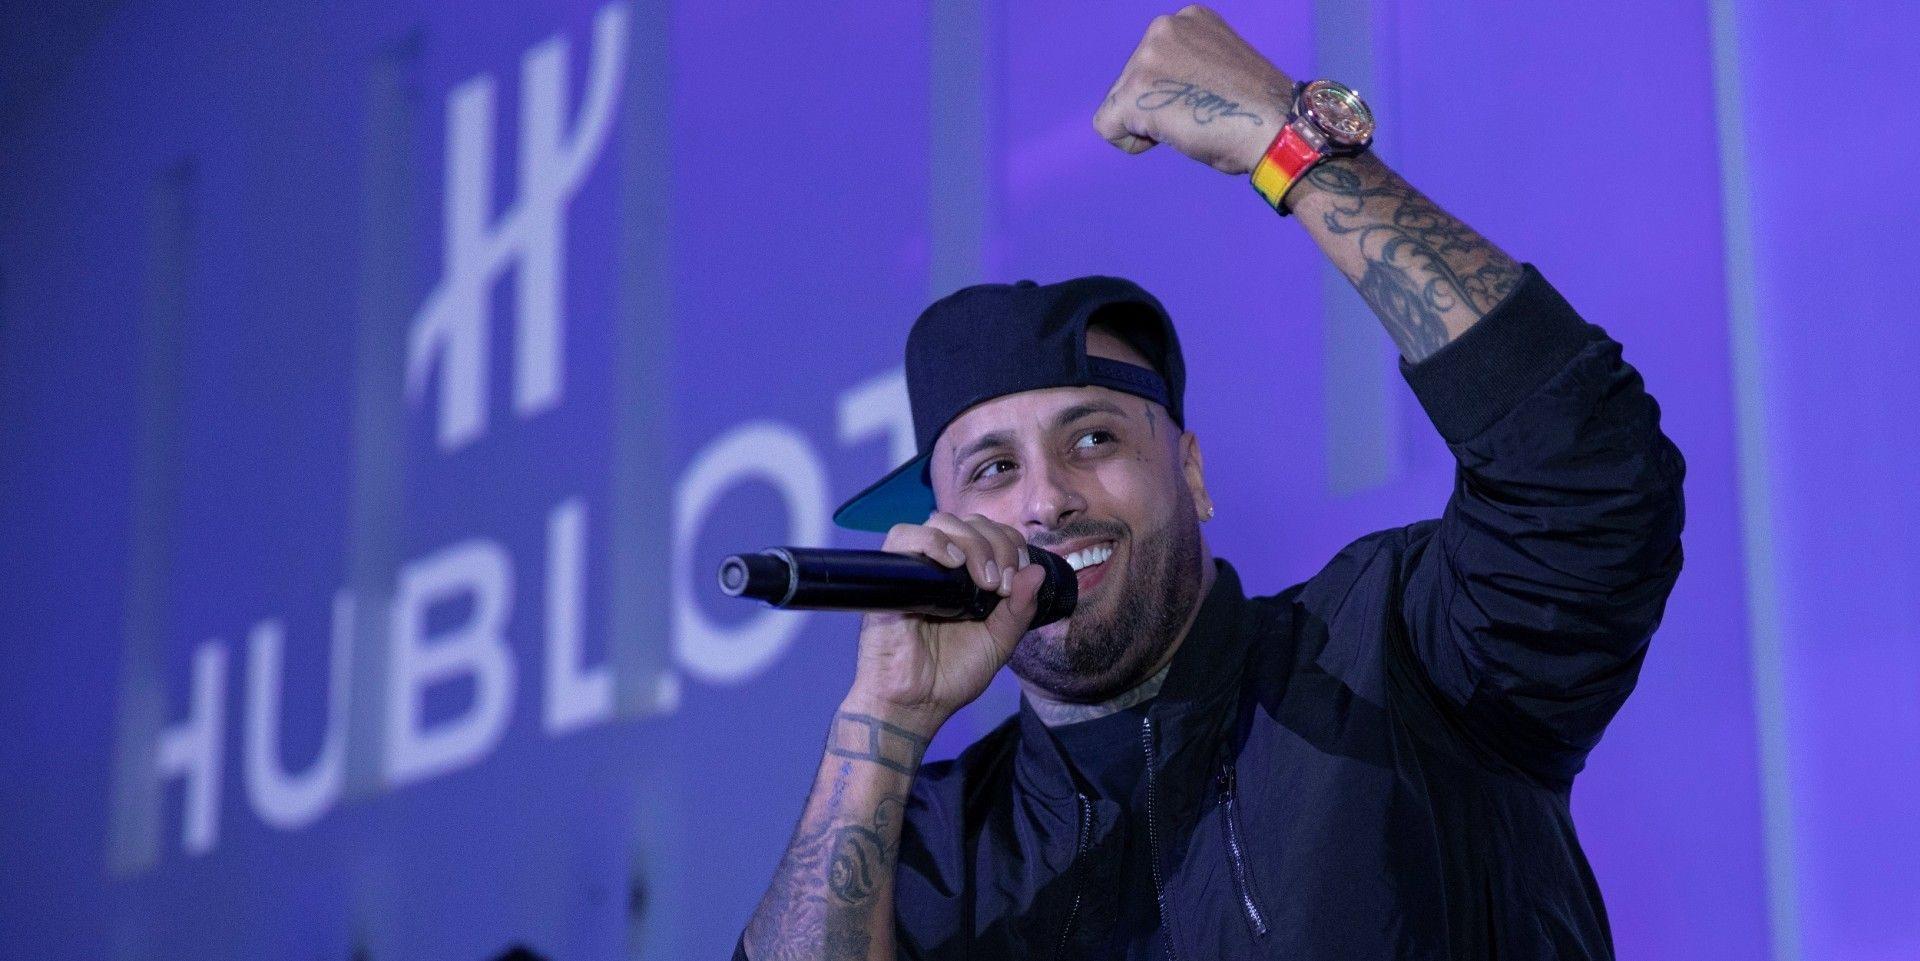 Hublot宇舶錶攜手品牌新任大使、雷鬼音樂藝術家Nicky Jam推出三款Big Bang Meca-10 Nicky Jam腕錶